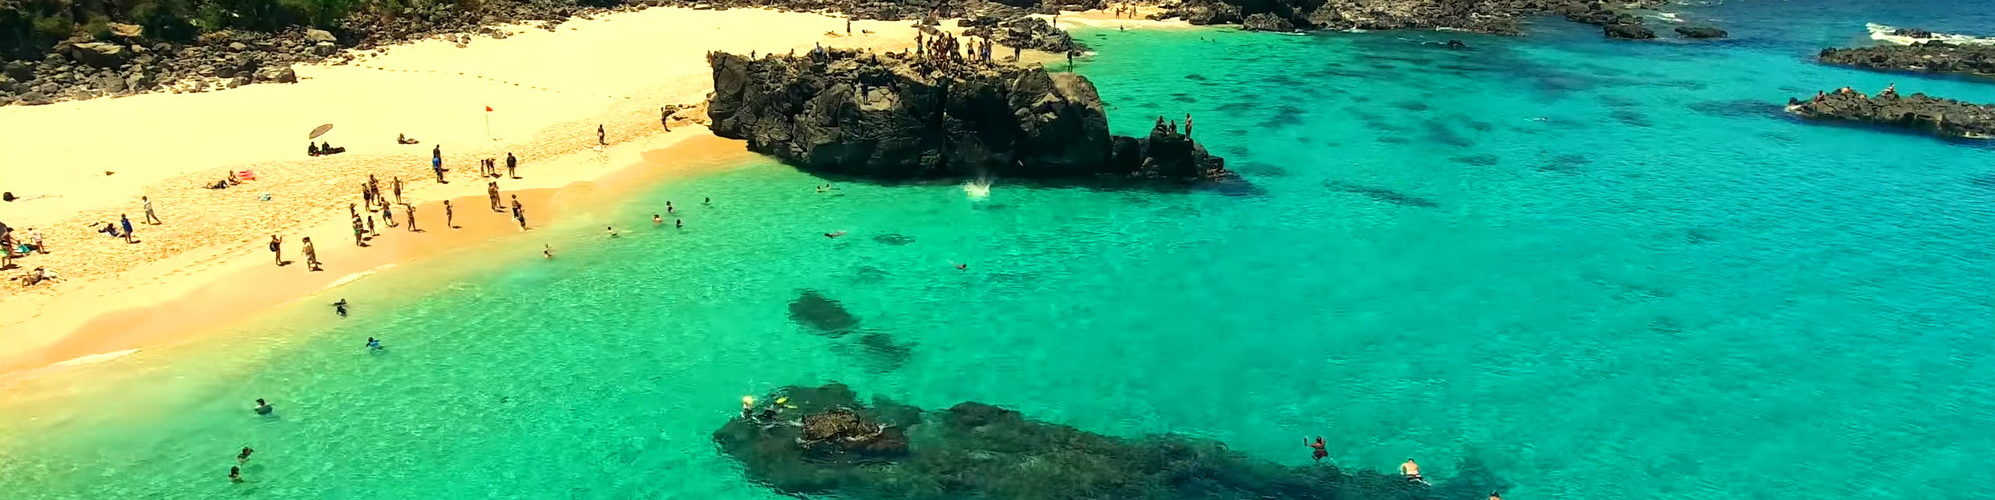 Waimea Bay, Hawaii